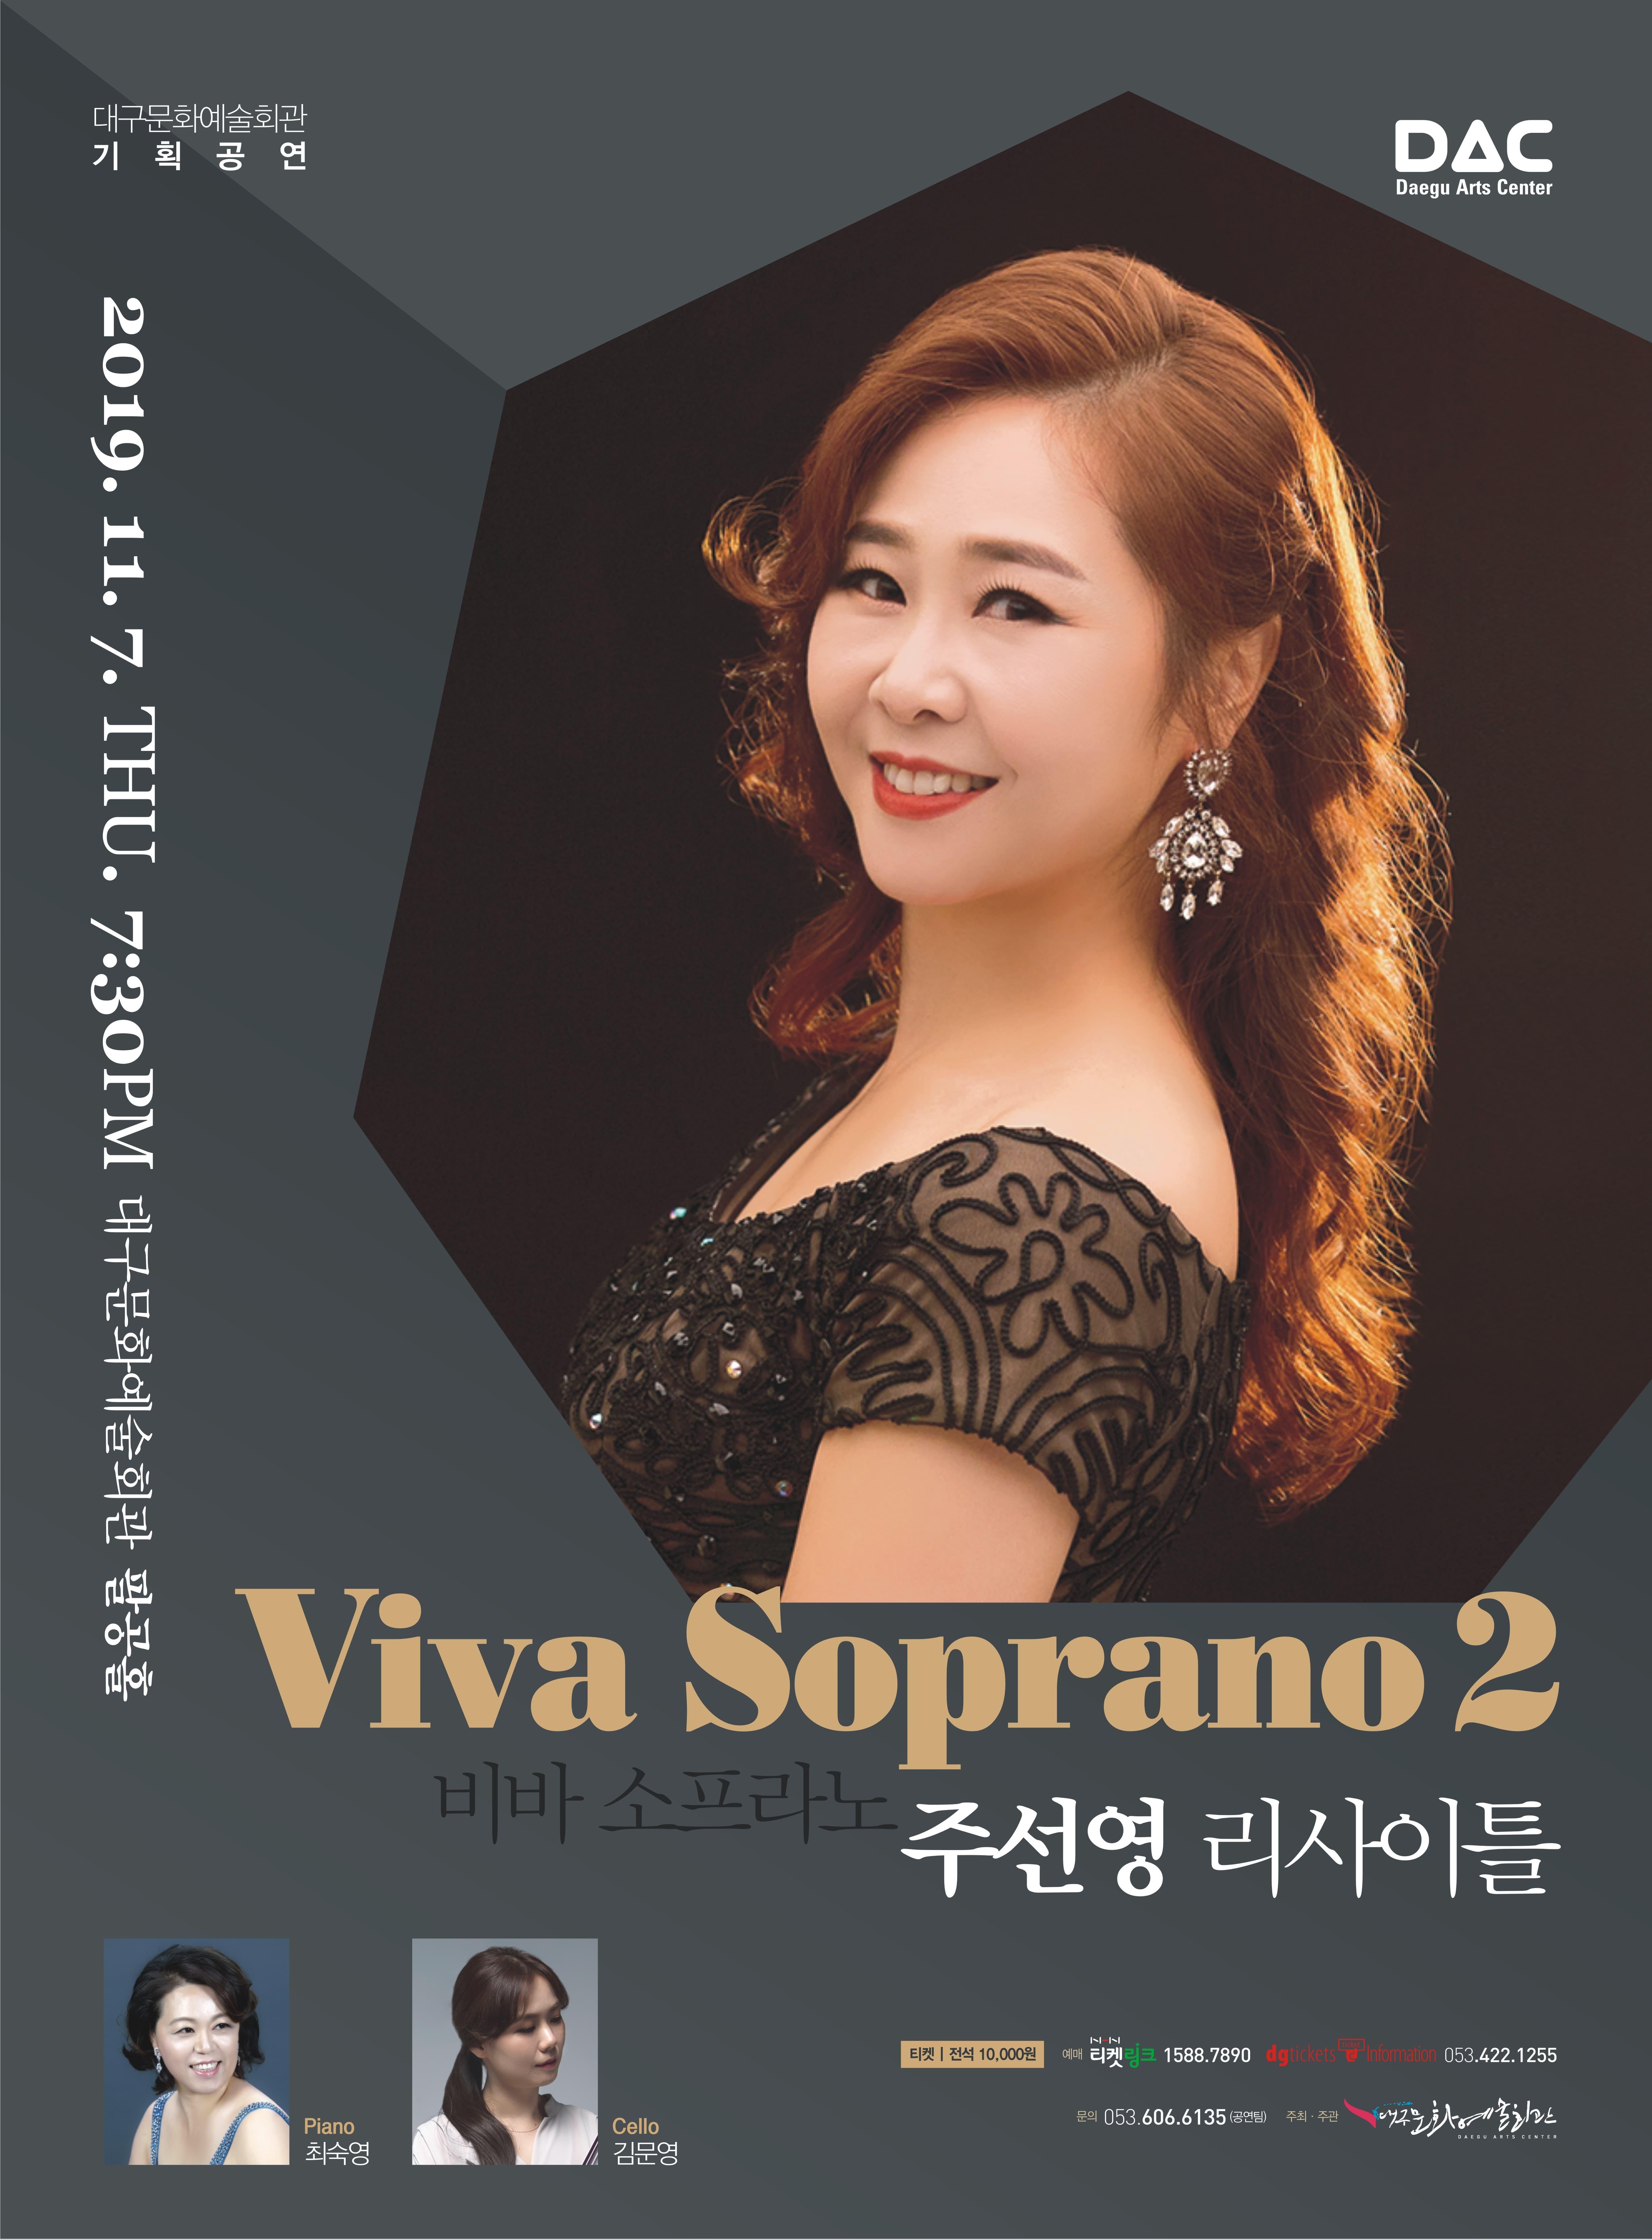 Viva Soprano2 - 주선영 리사이틀